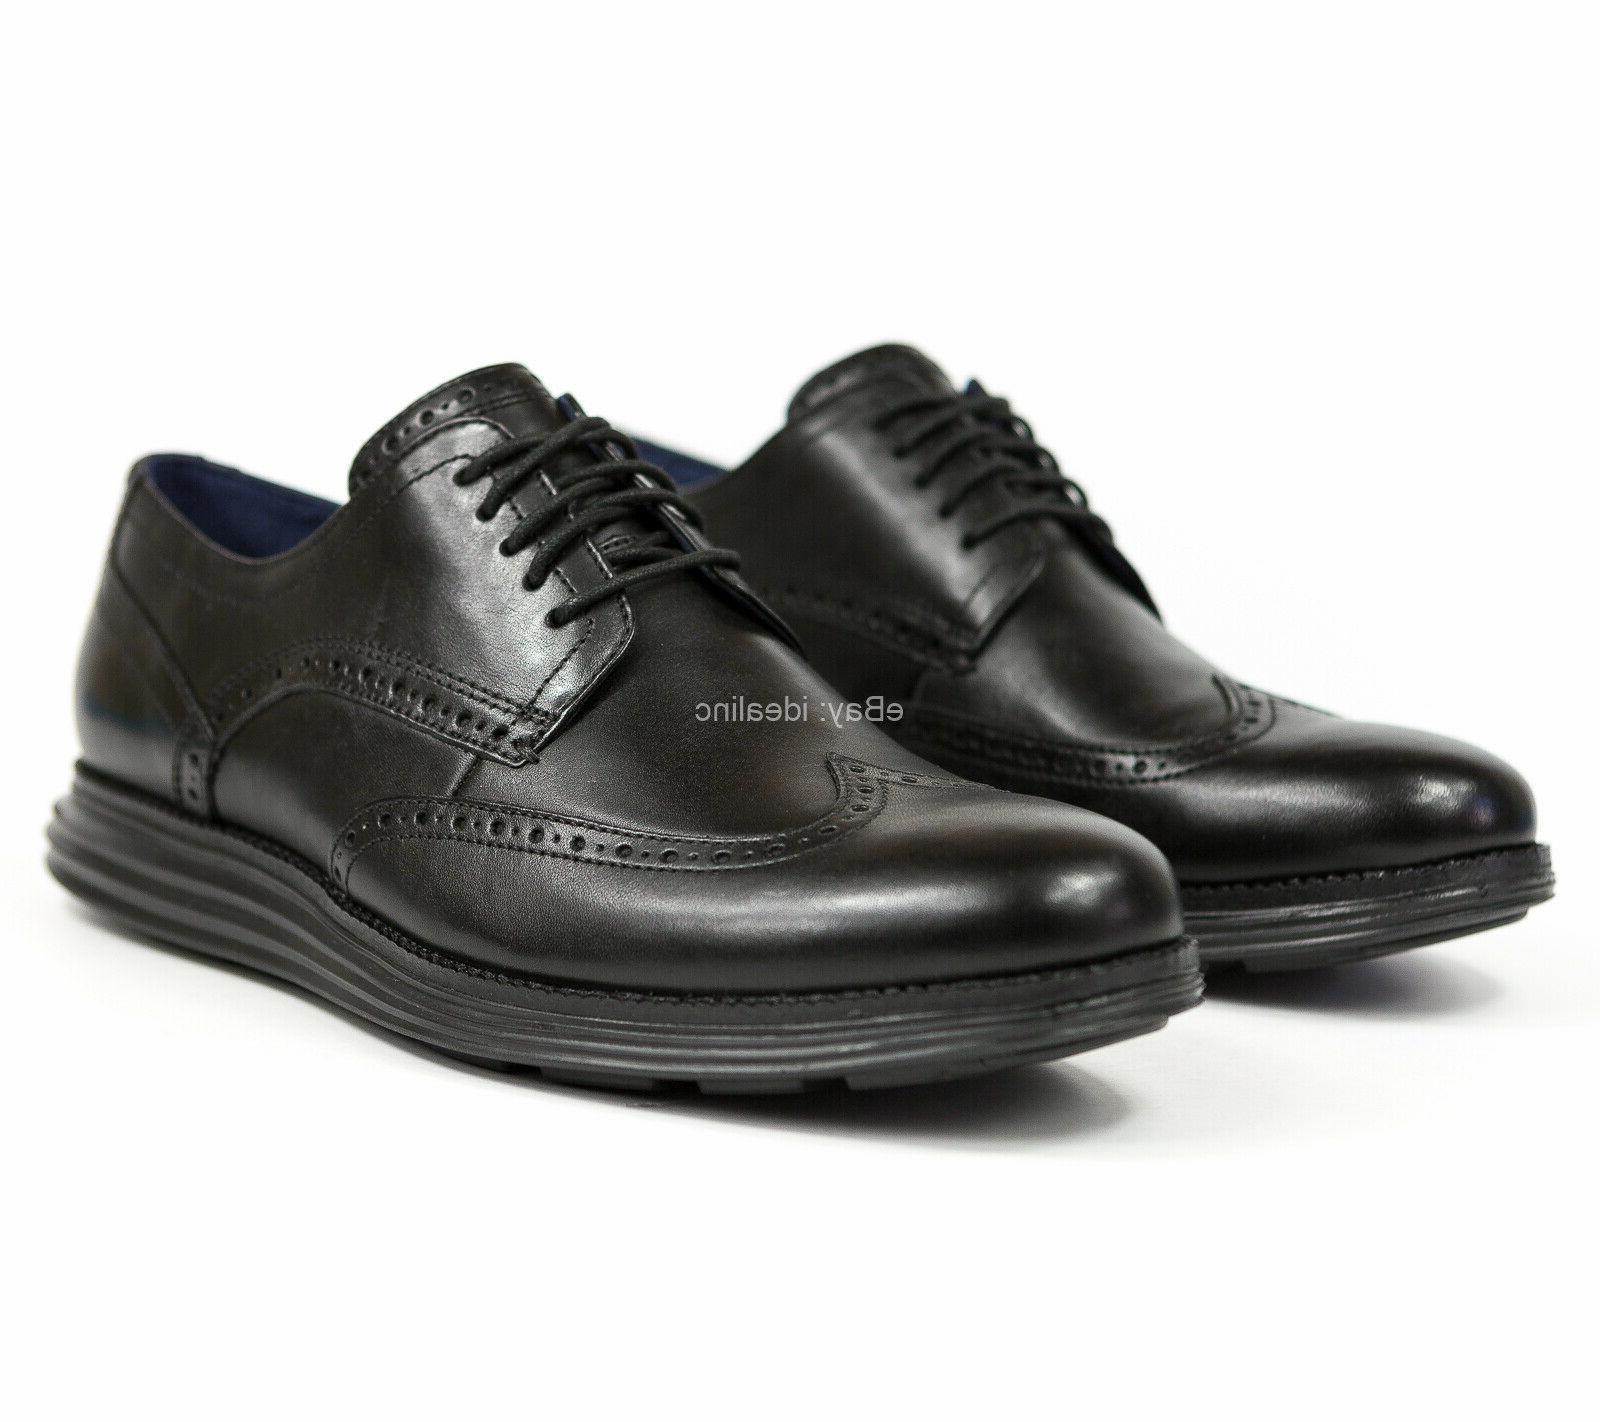 Cole Haan OriginalGrand Wingtip Oxford Black Leather Shoes C